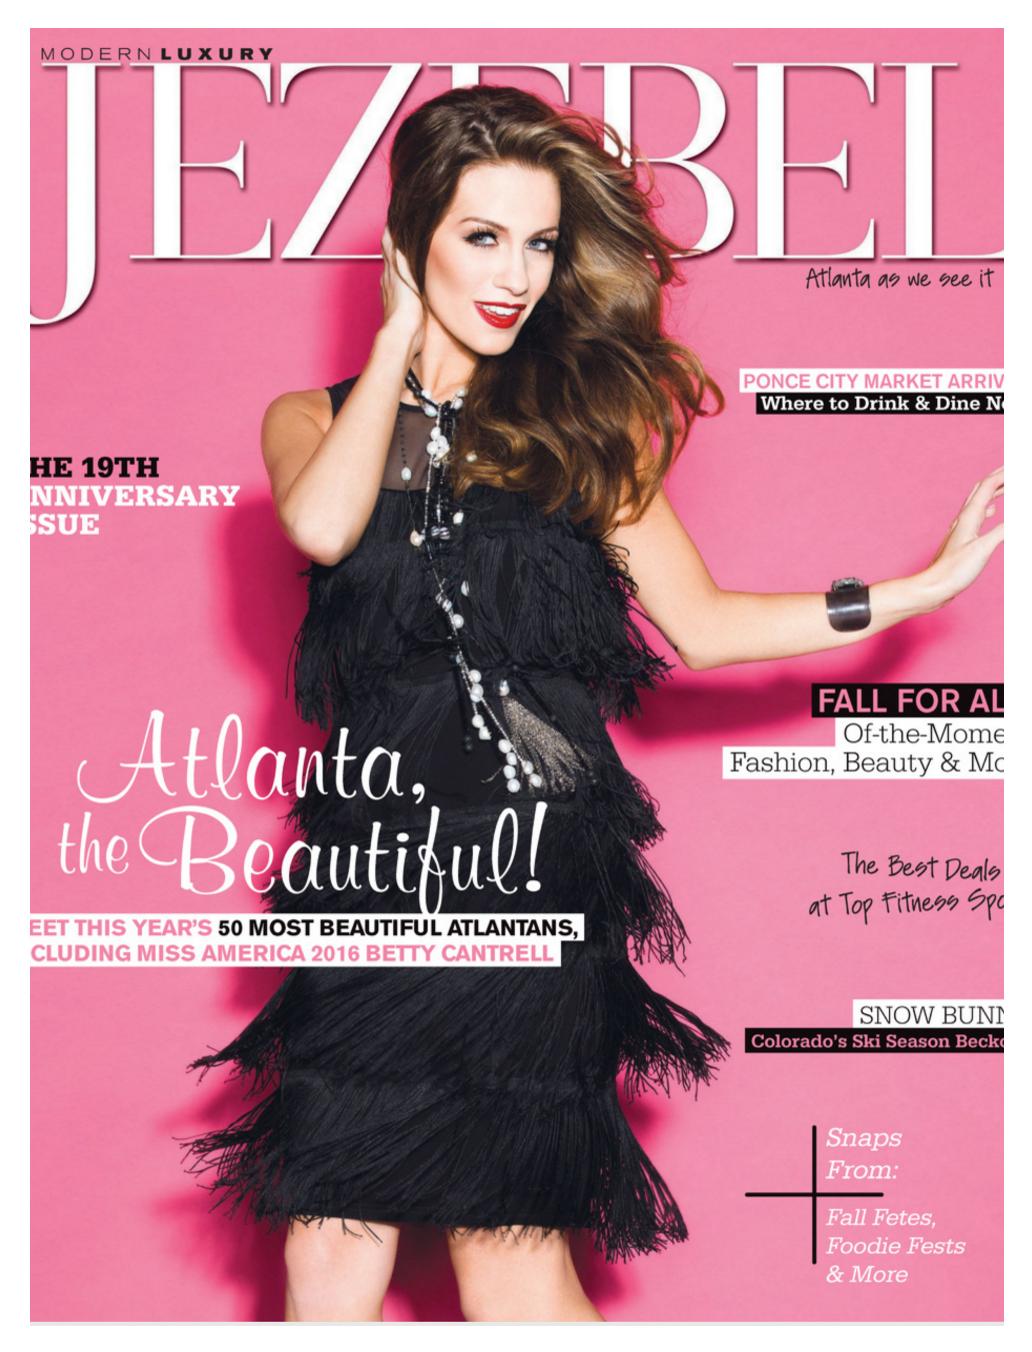 Jezebel Magazine | November 2015